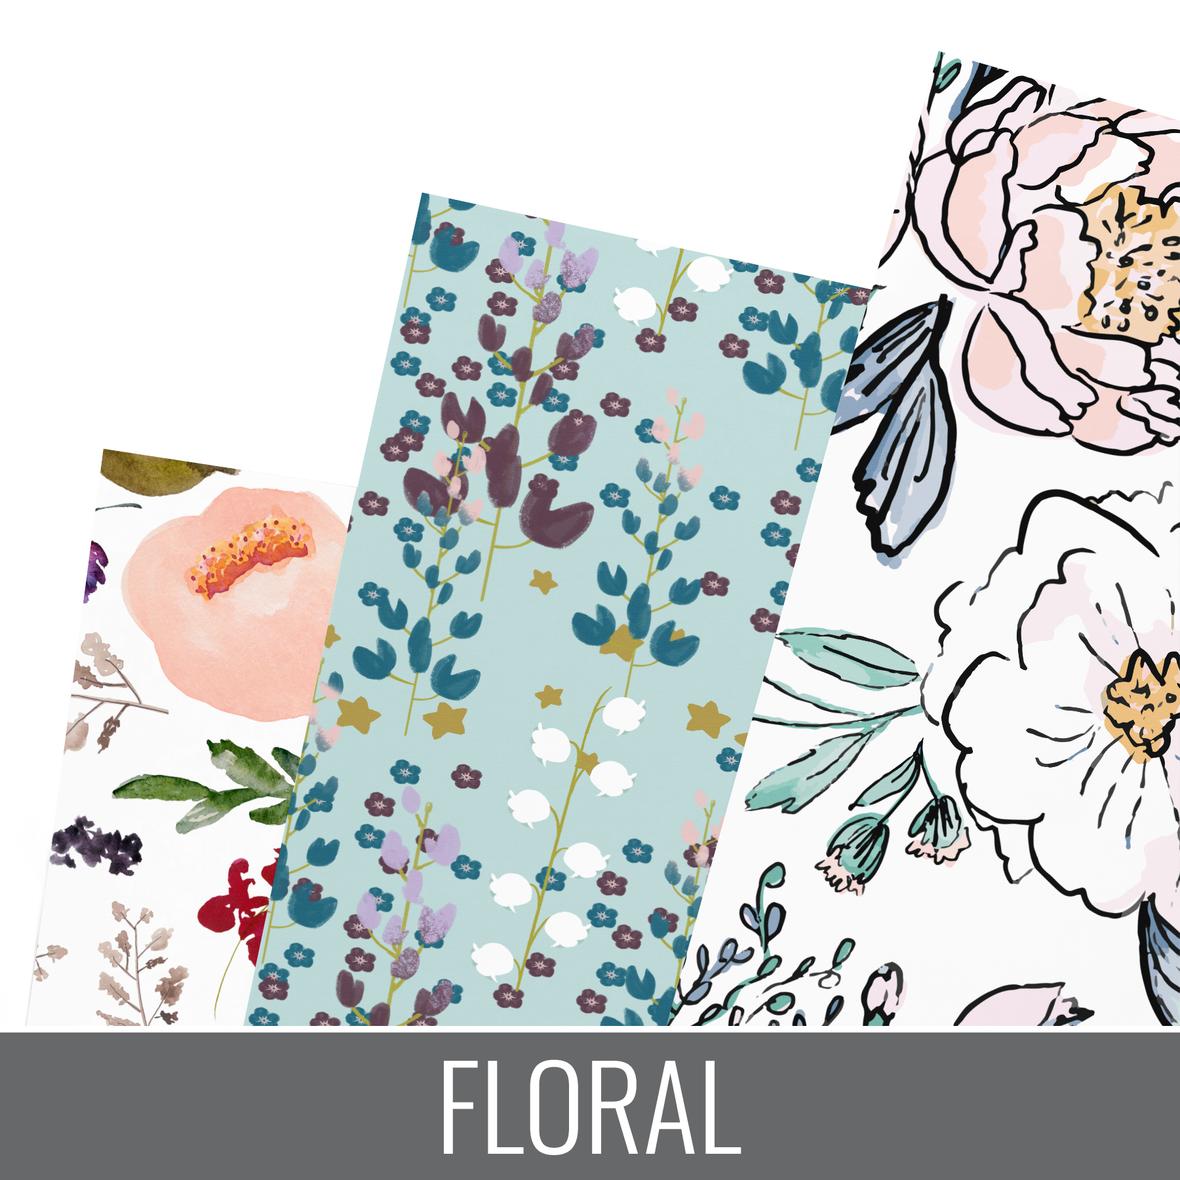 Florals v2 final